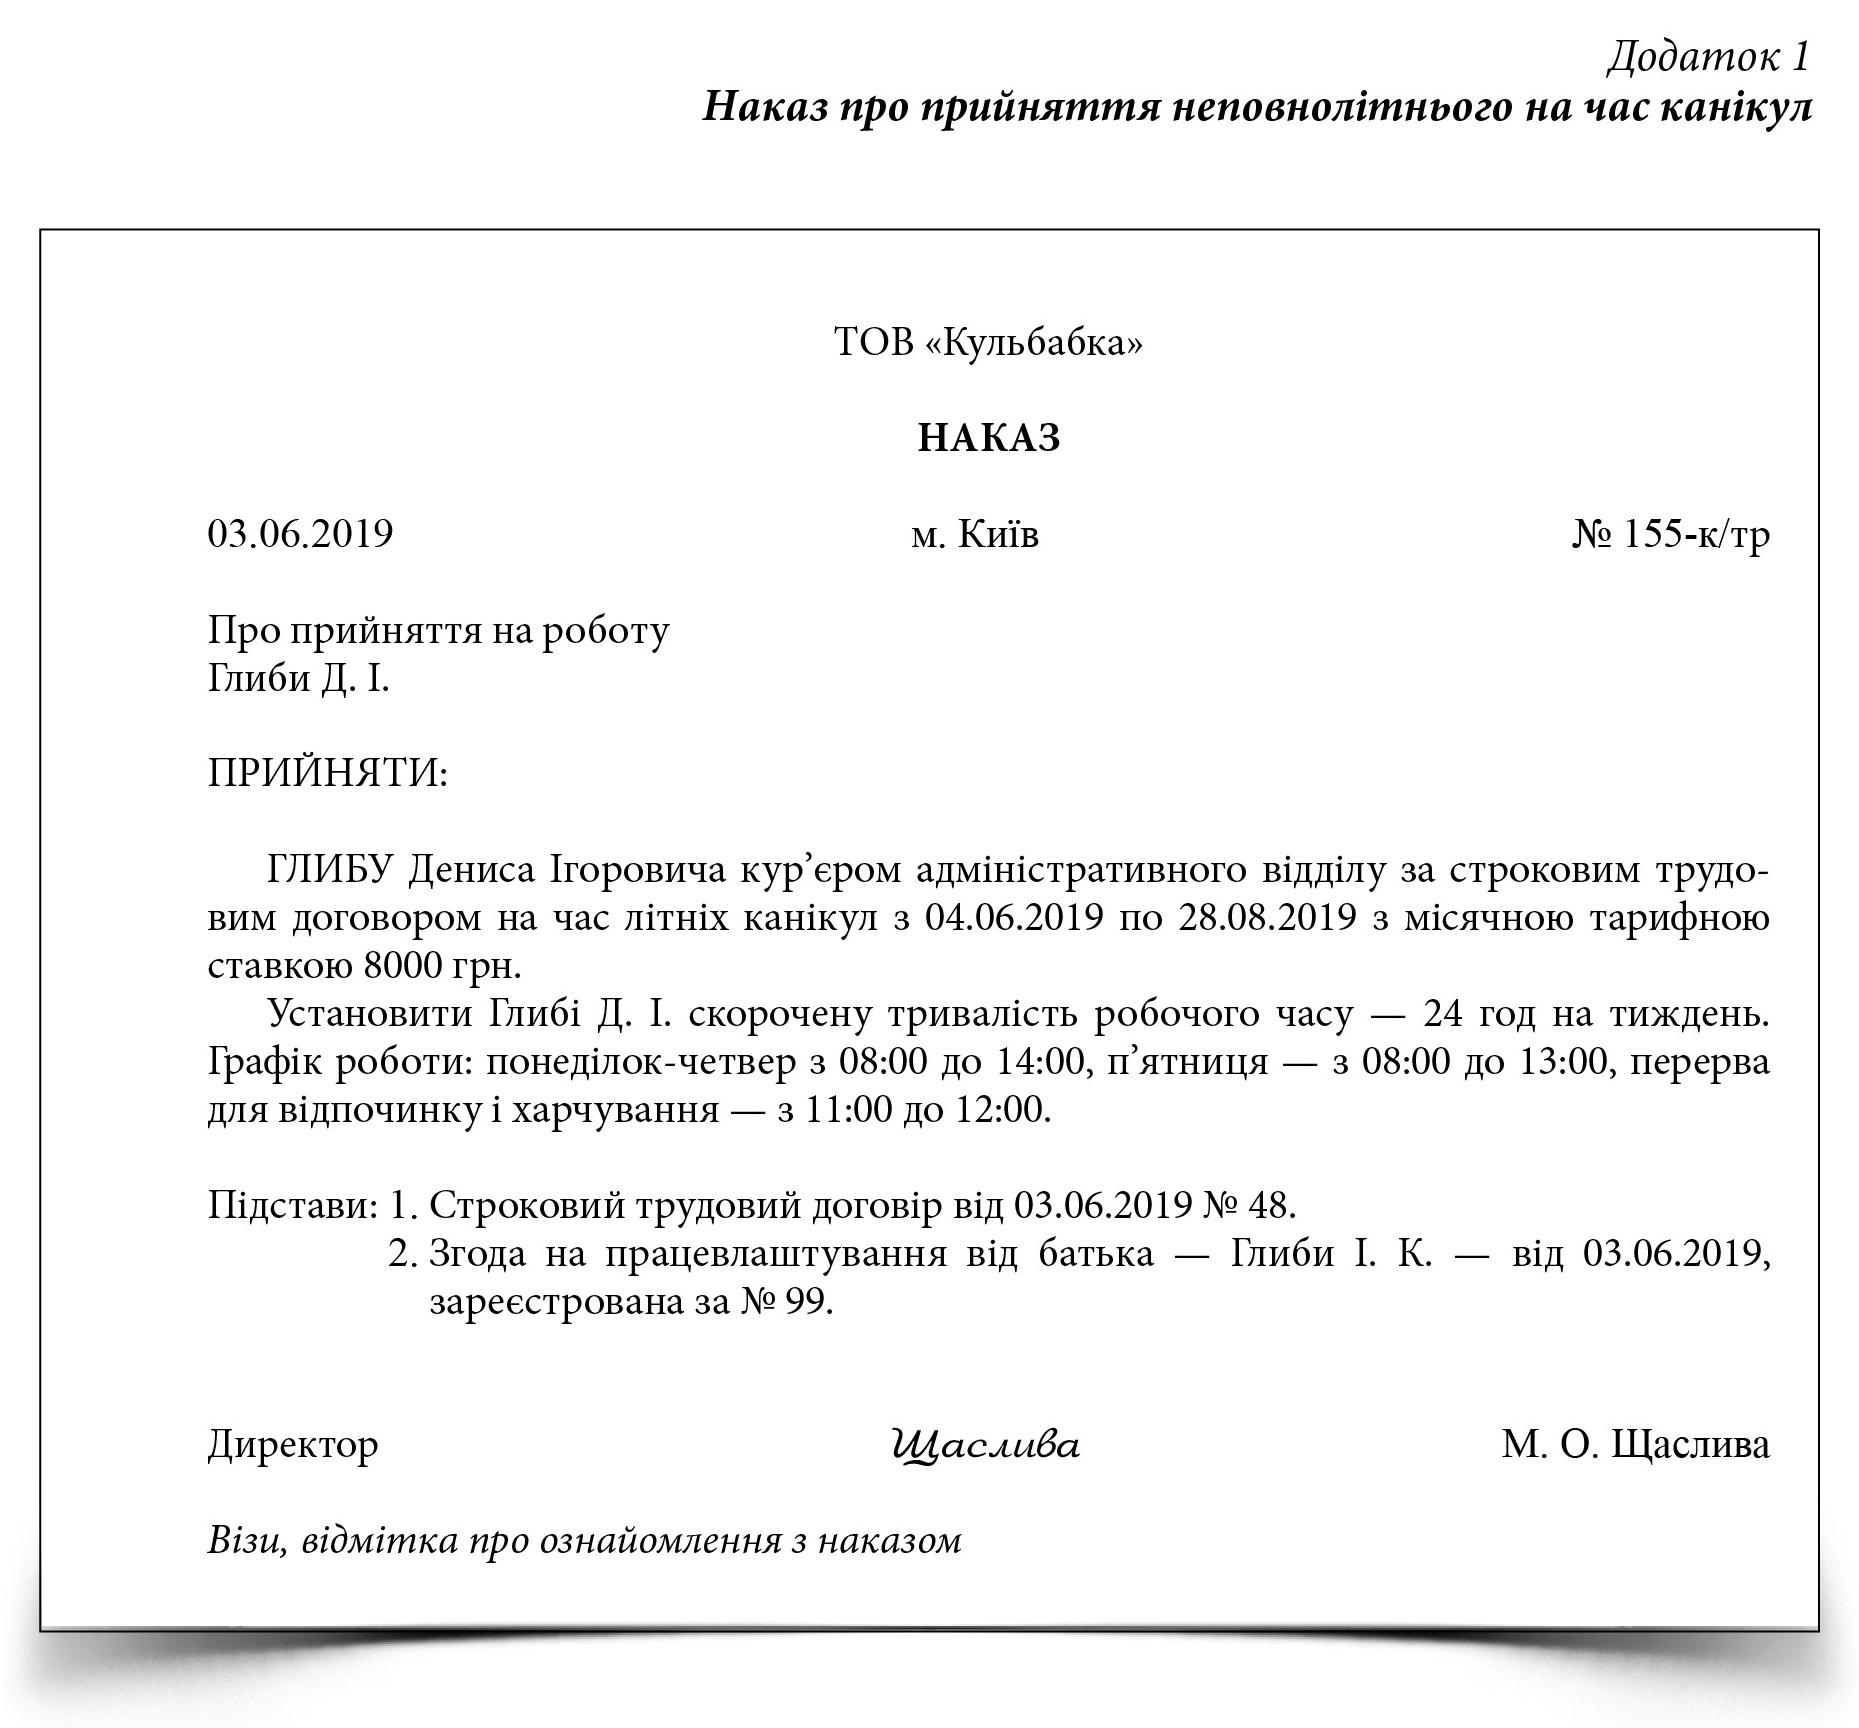 https://e.profkiosk.ru/service_tbn2/ezmhdo.jpg